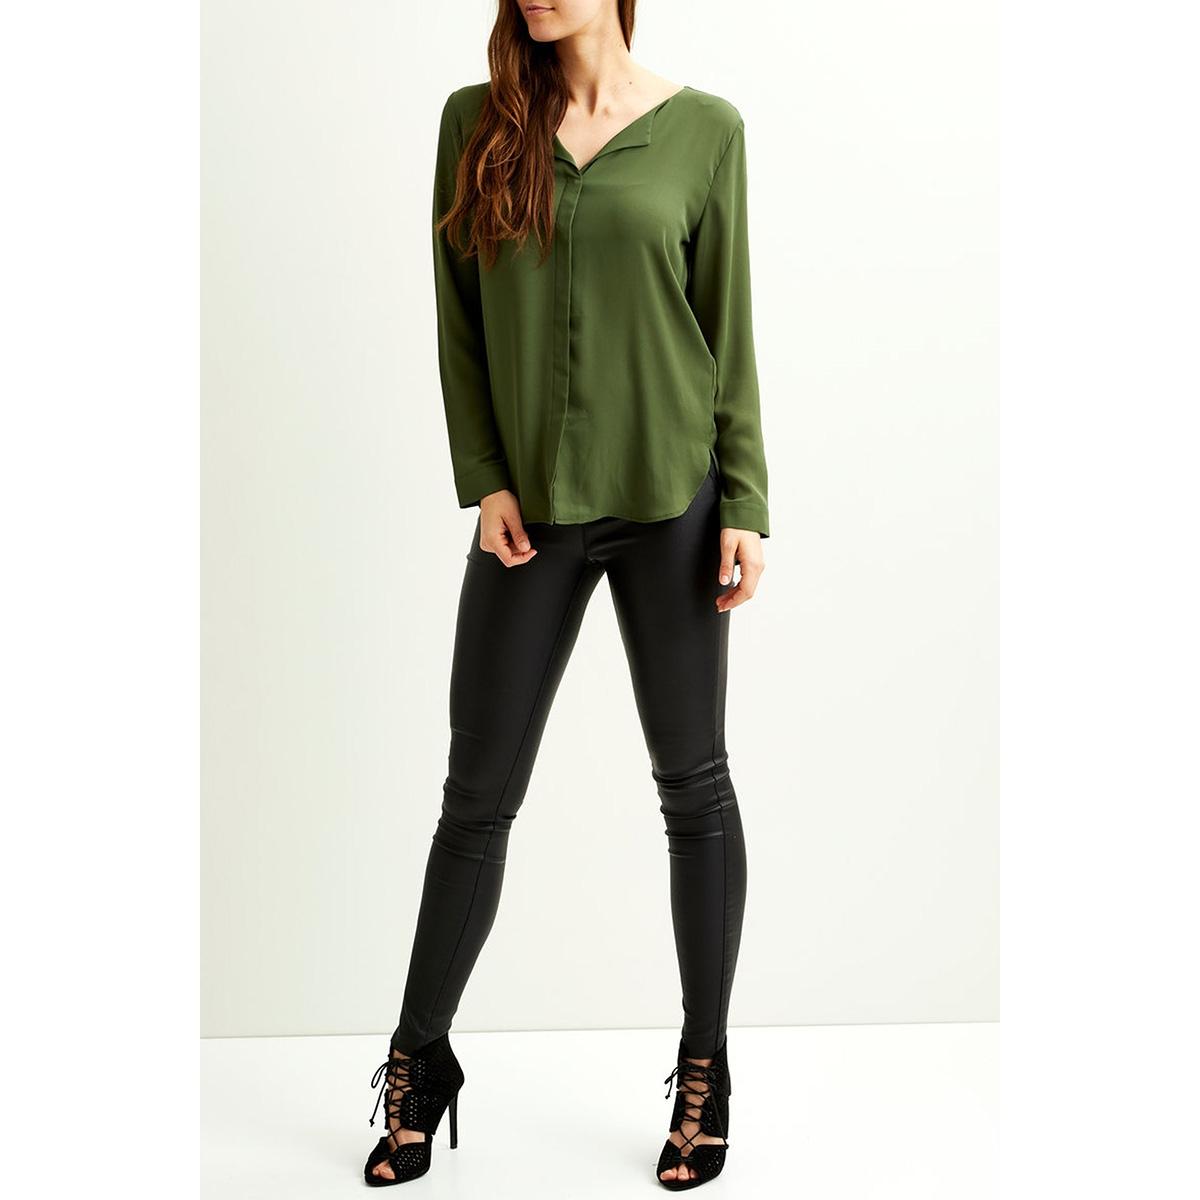 vilucy l/s shirt - fav 14044583 vila blouse chive